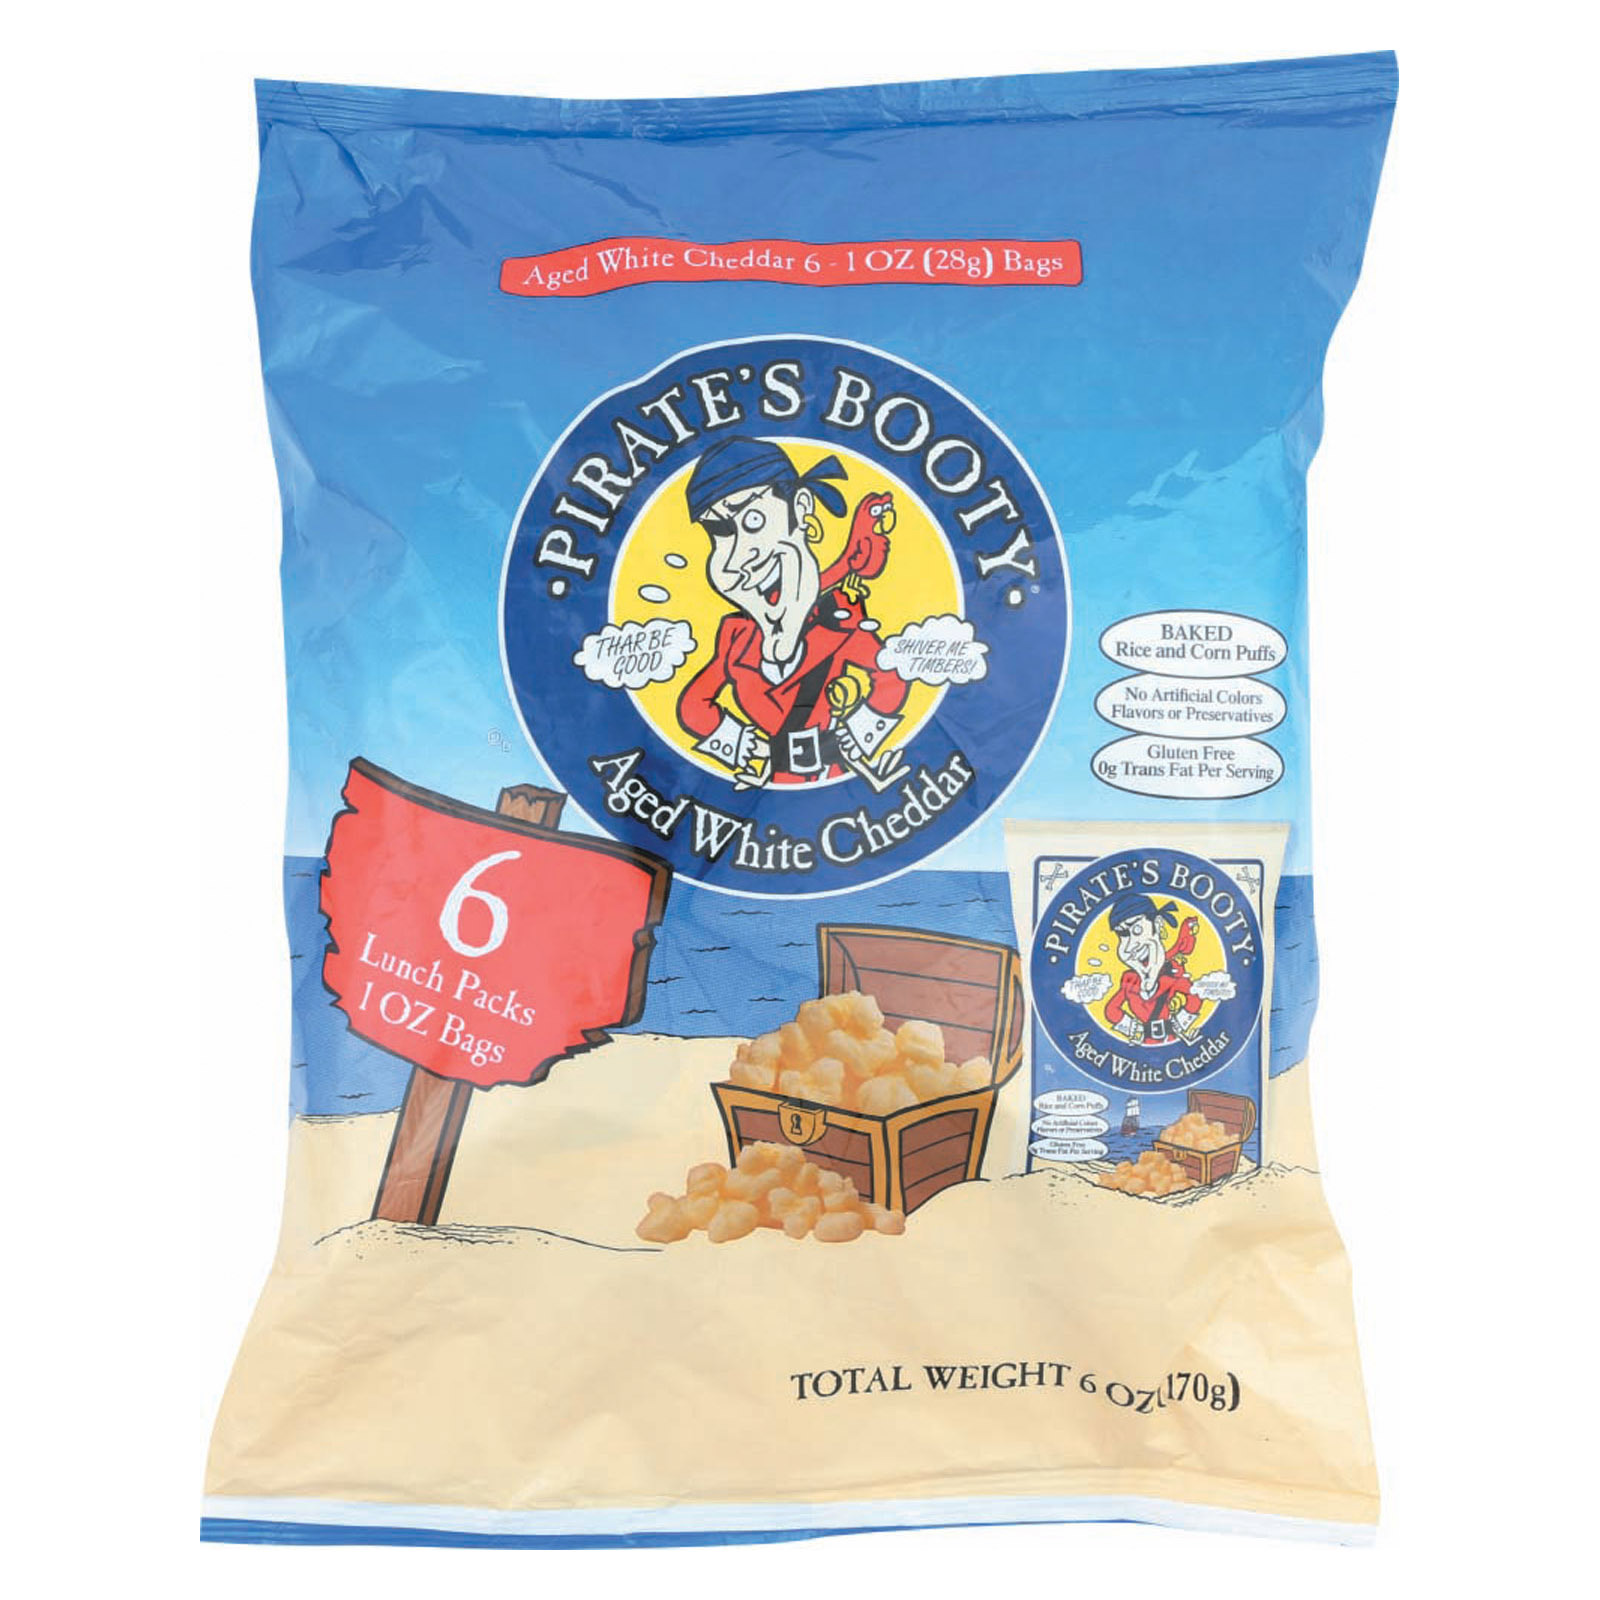 Pirate Brands Pirate's Booty Multipack - Case of 12 - 6/1 oz